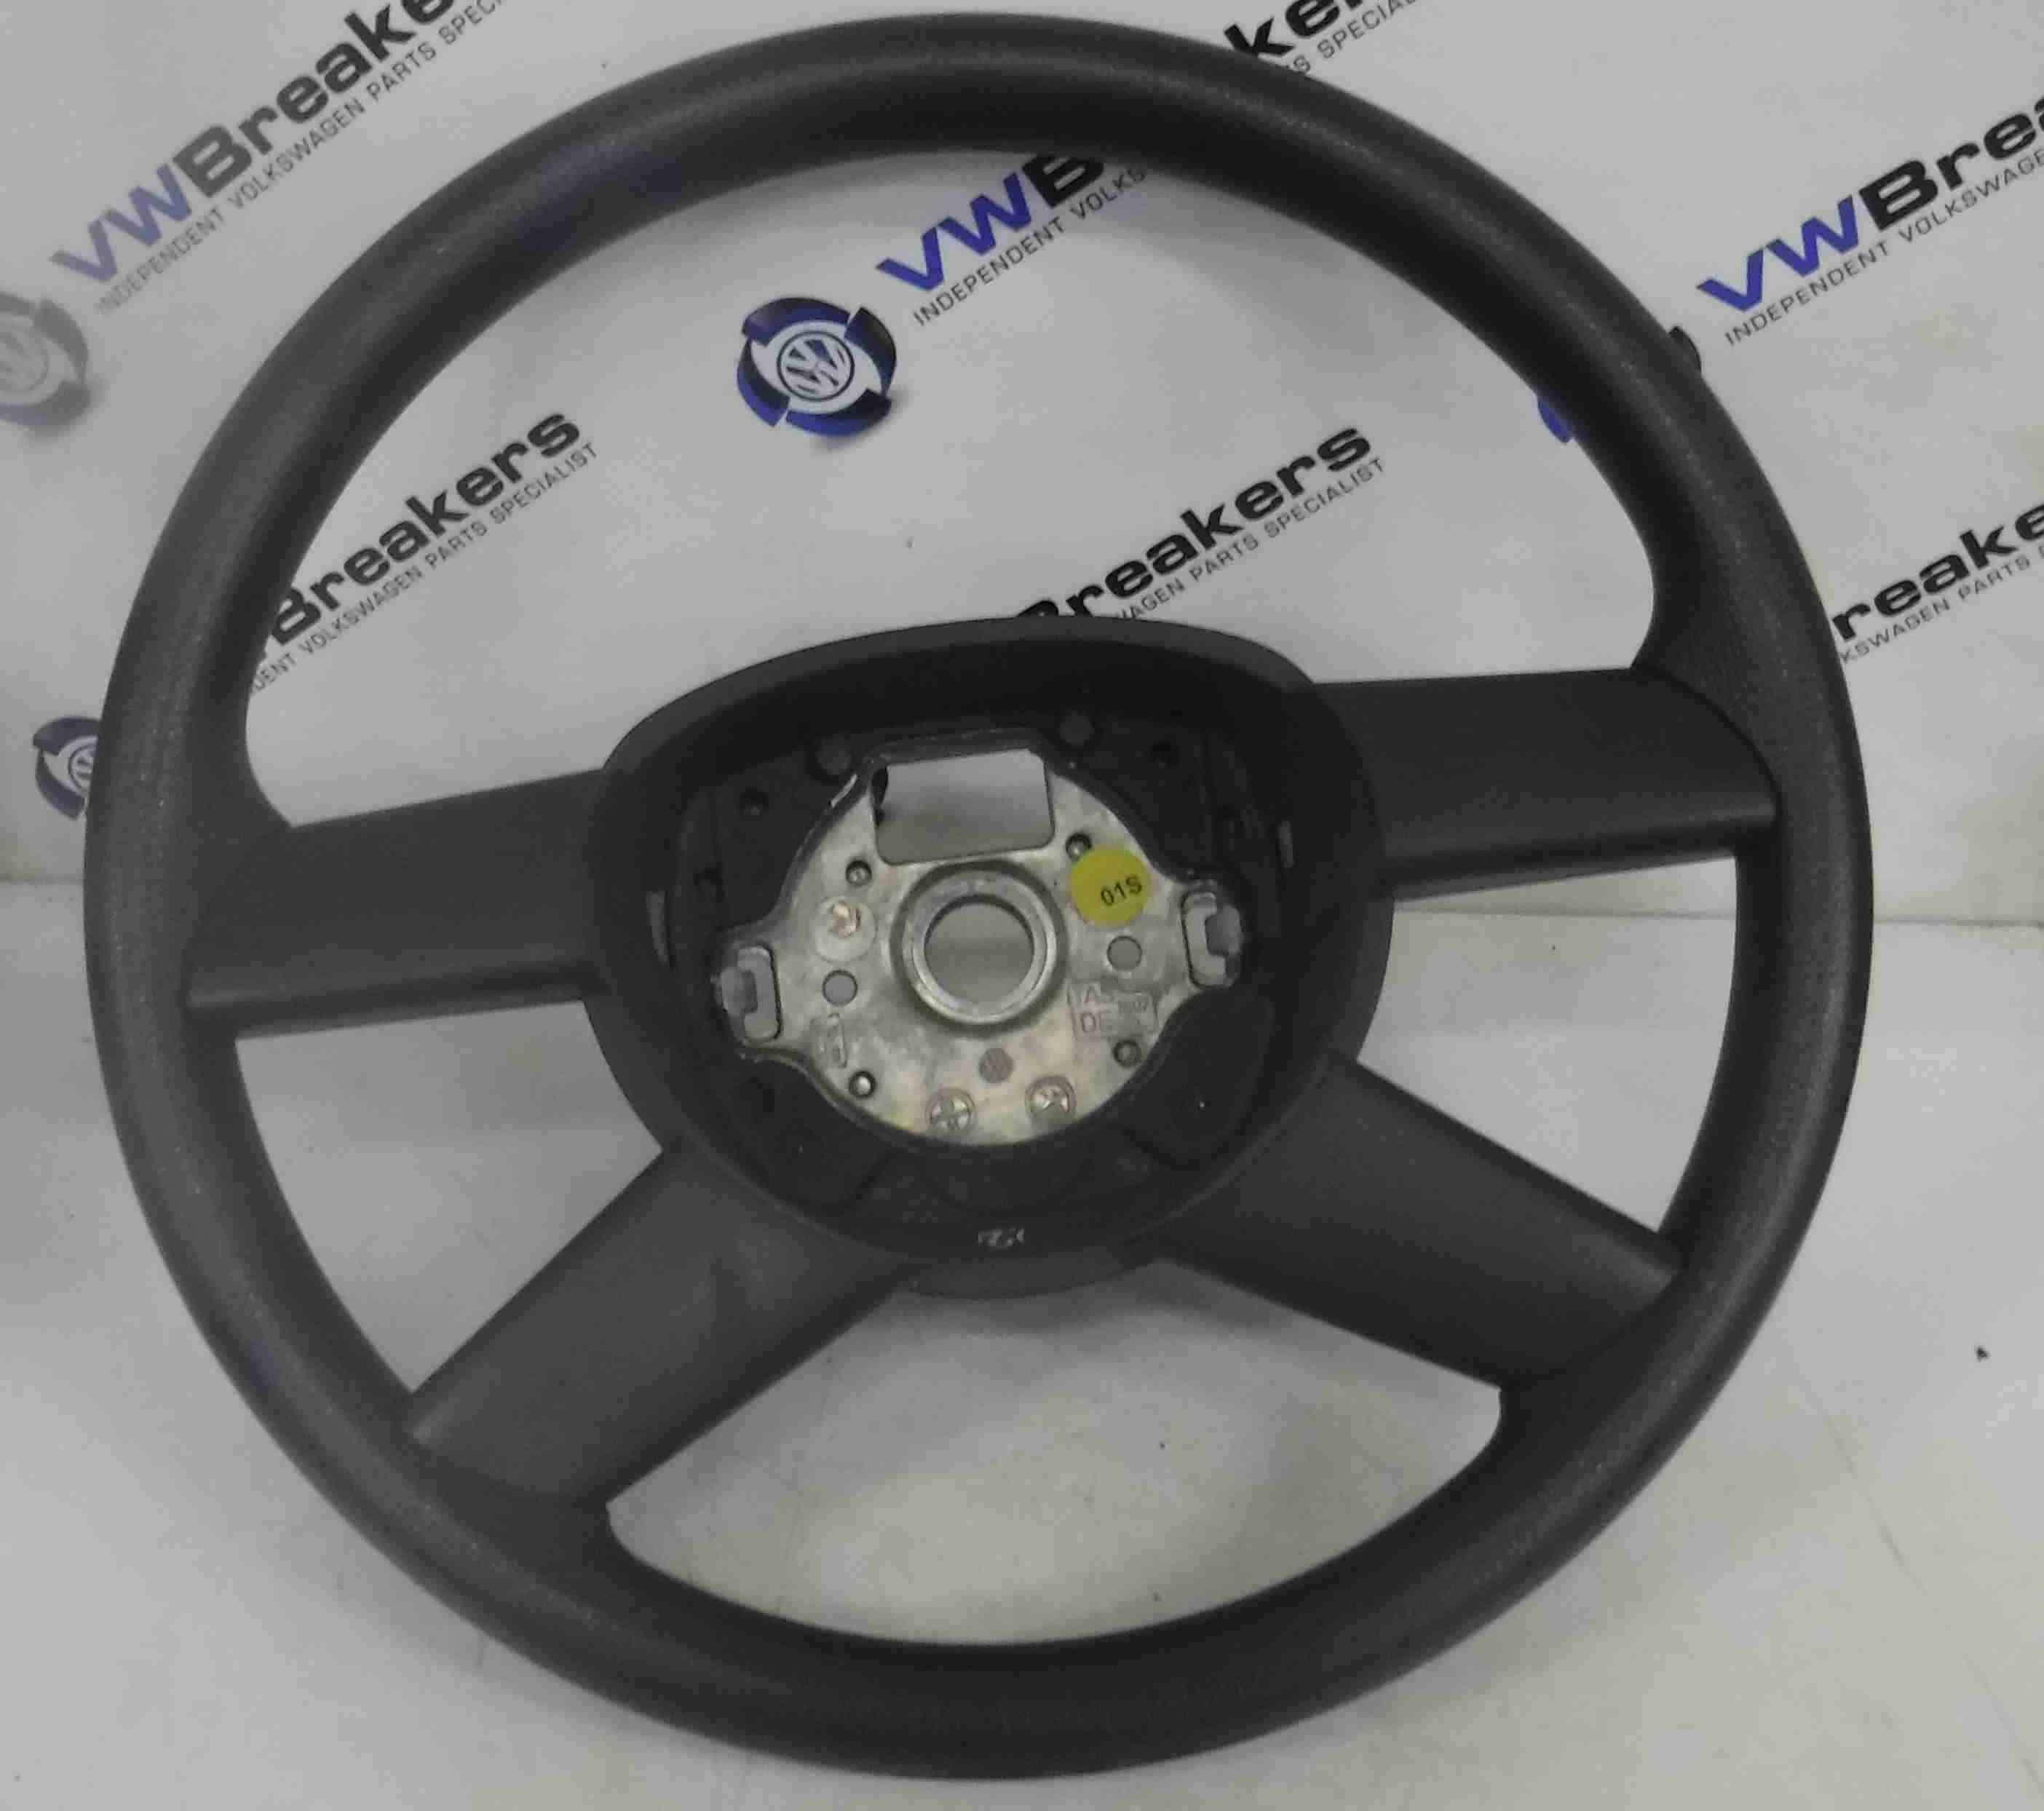 Volkswagen Golf MK5 2003-2009 Drivers Steering Wheel 1k0419091